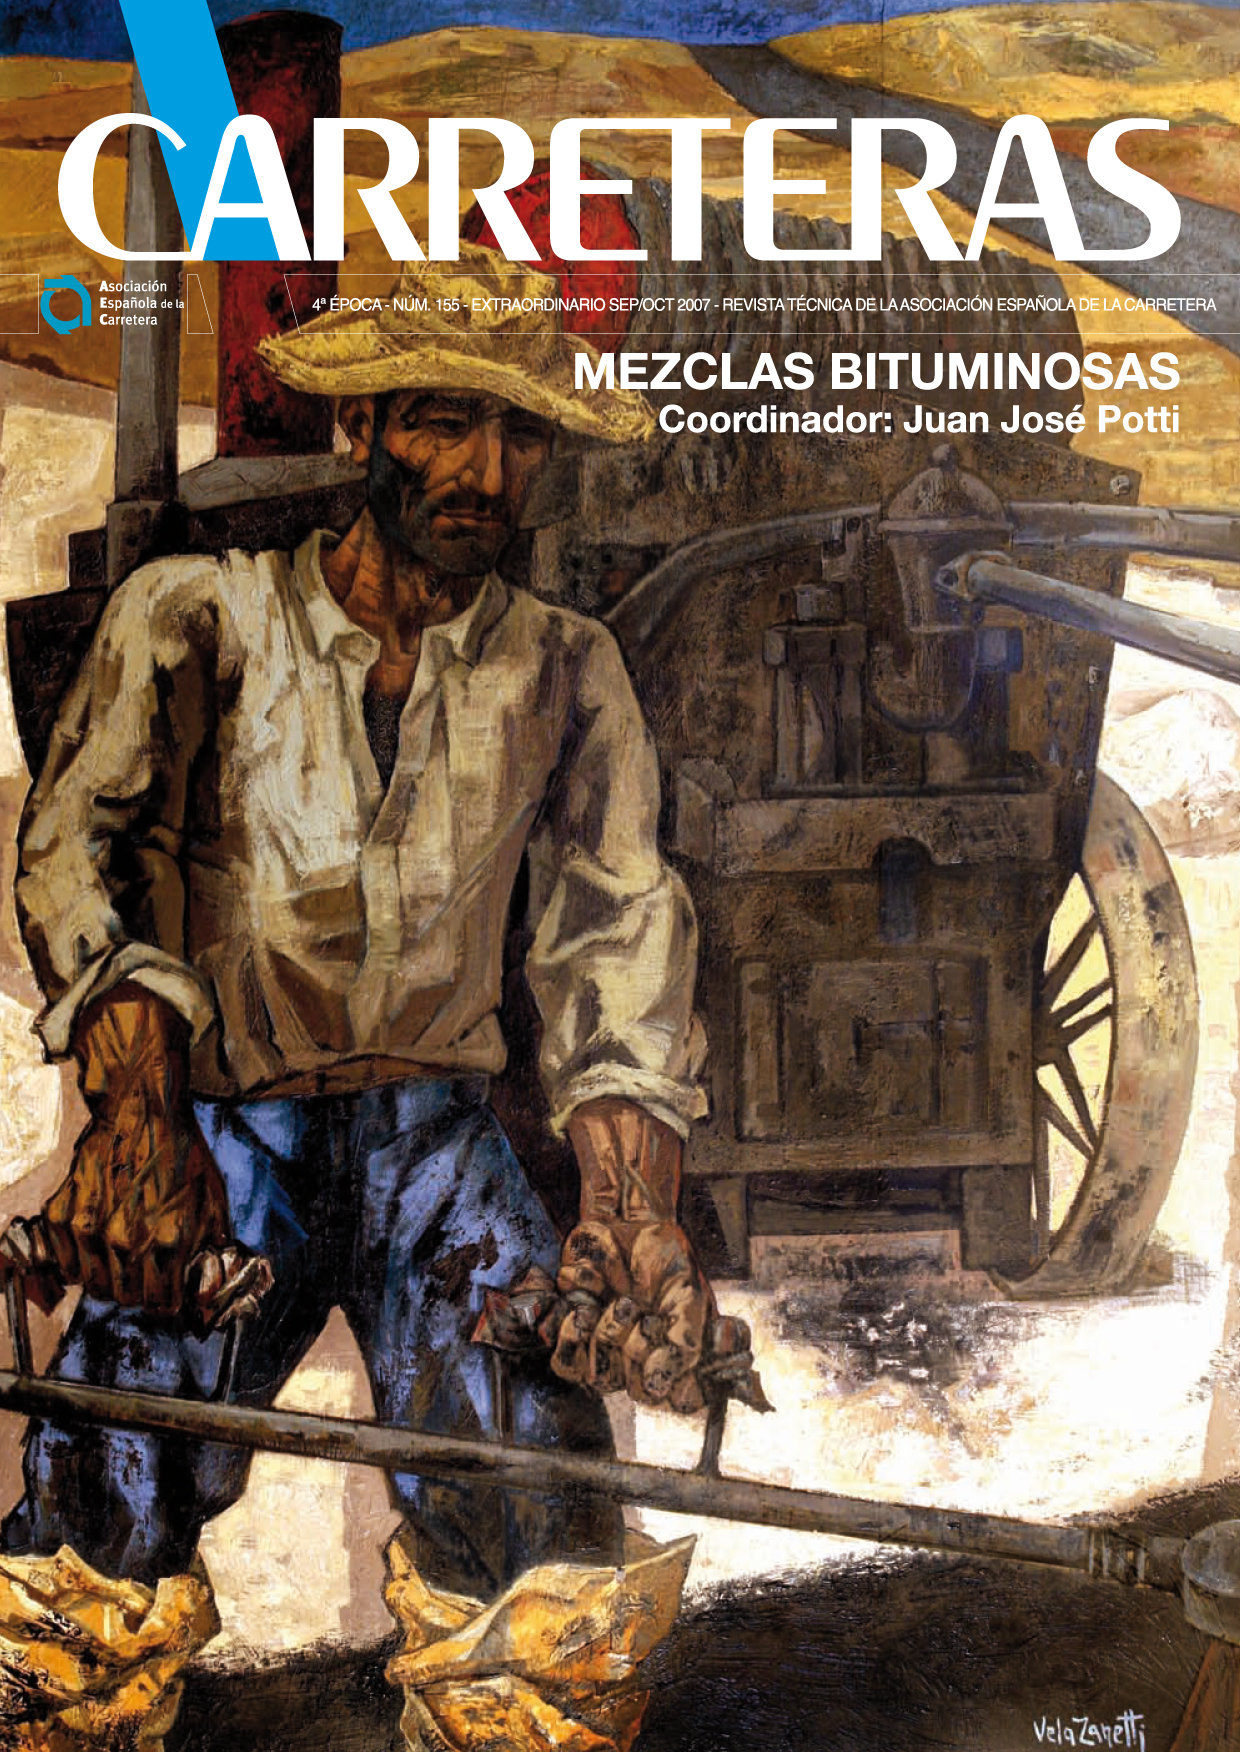 Nº 155 - Sep/Oct 2007 - Extraordinario Mezclas Bituminosas